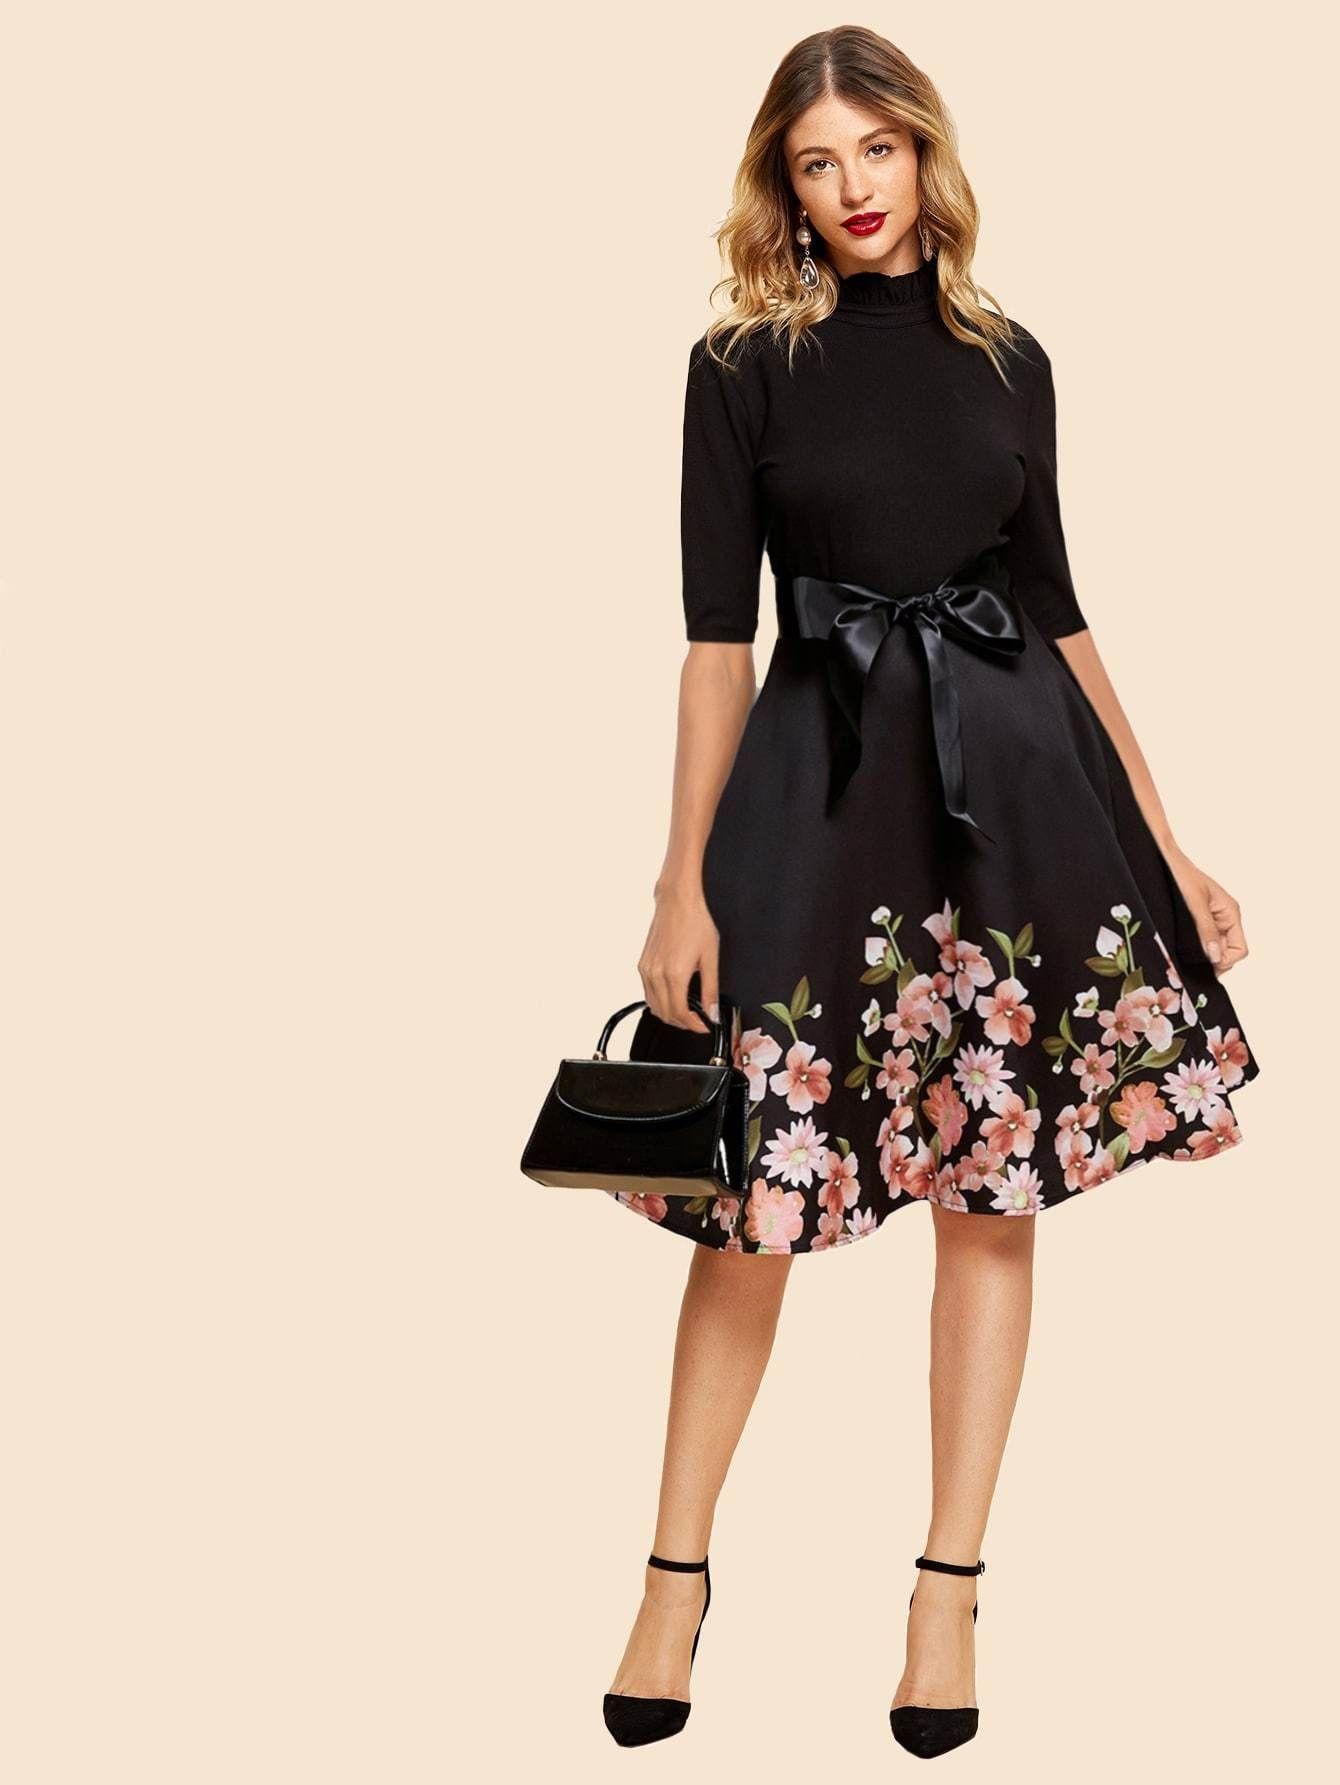 65992826e8 50s tie front floral print dress. #dresses #clothing #women #fashion ...